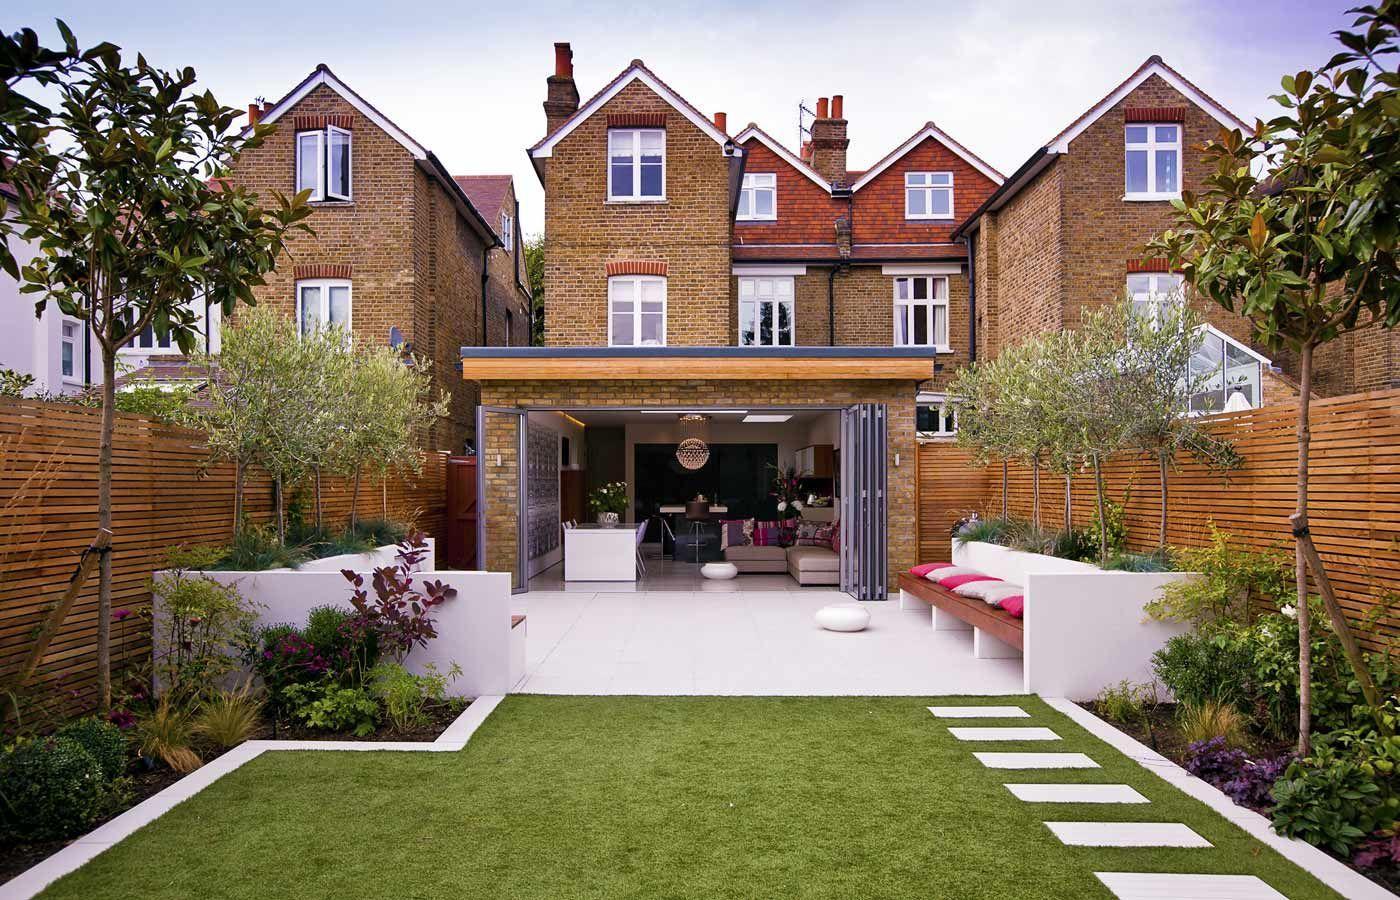 Image result for terraced house back garden ideas Modern